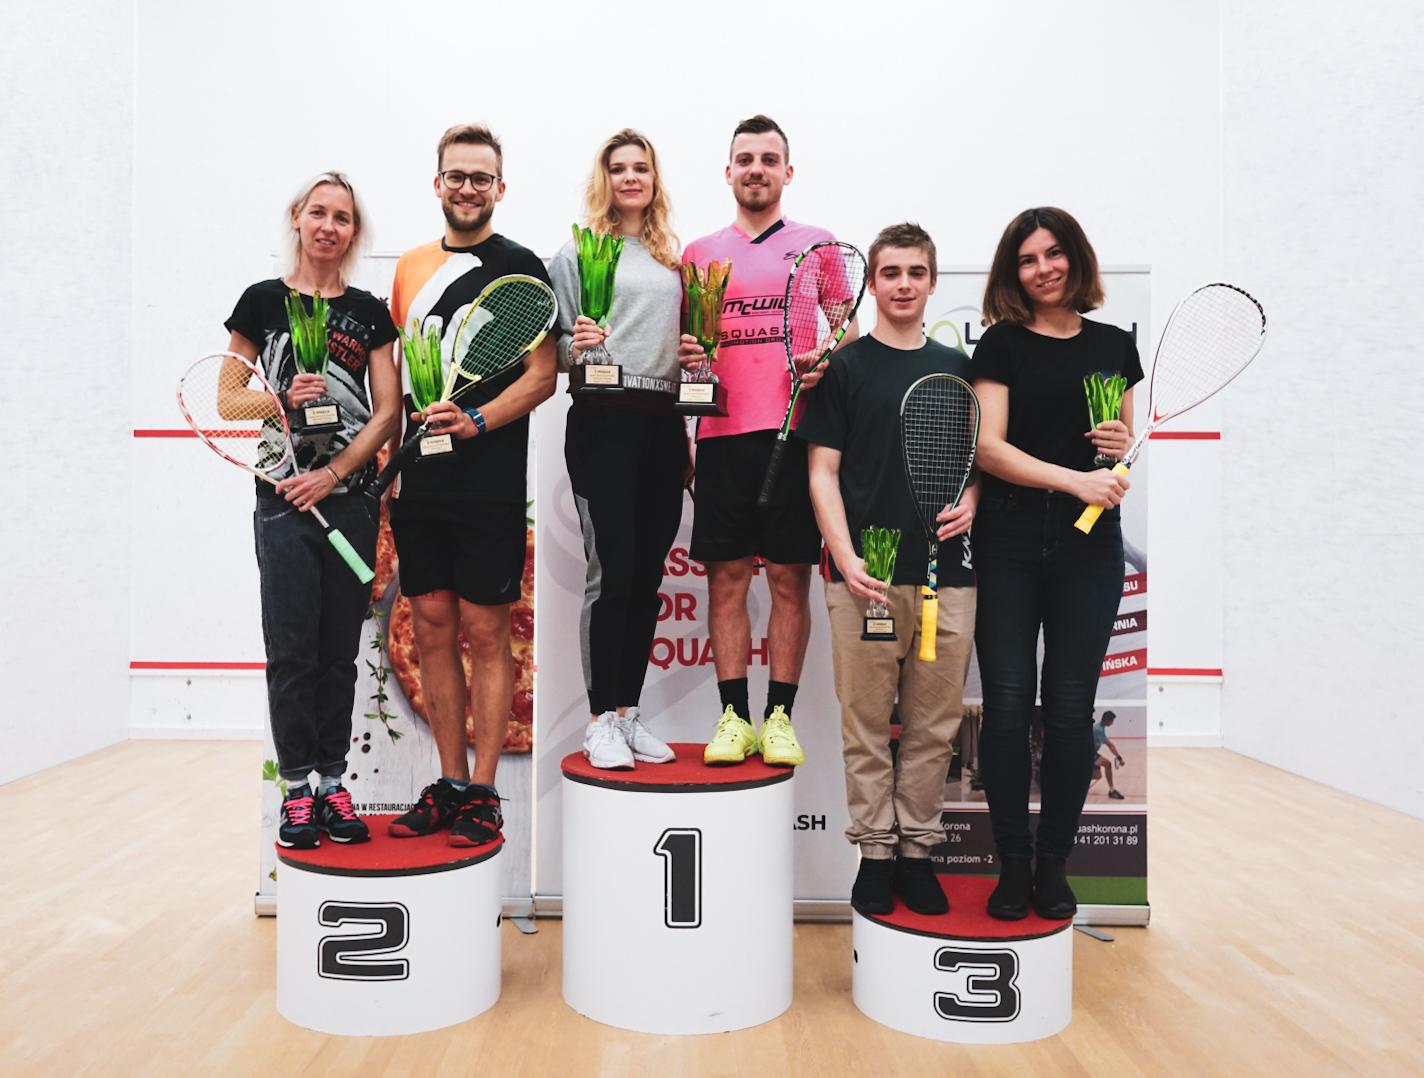 Seniorski turniej rangi A, Squash Korona, Kielce